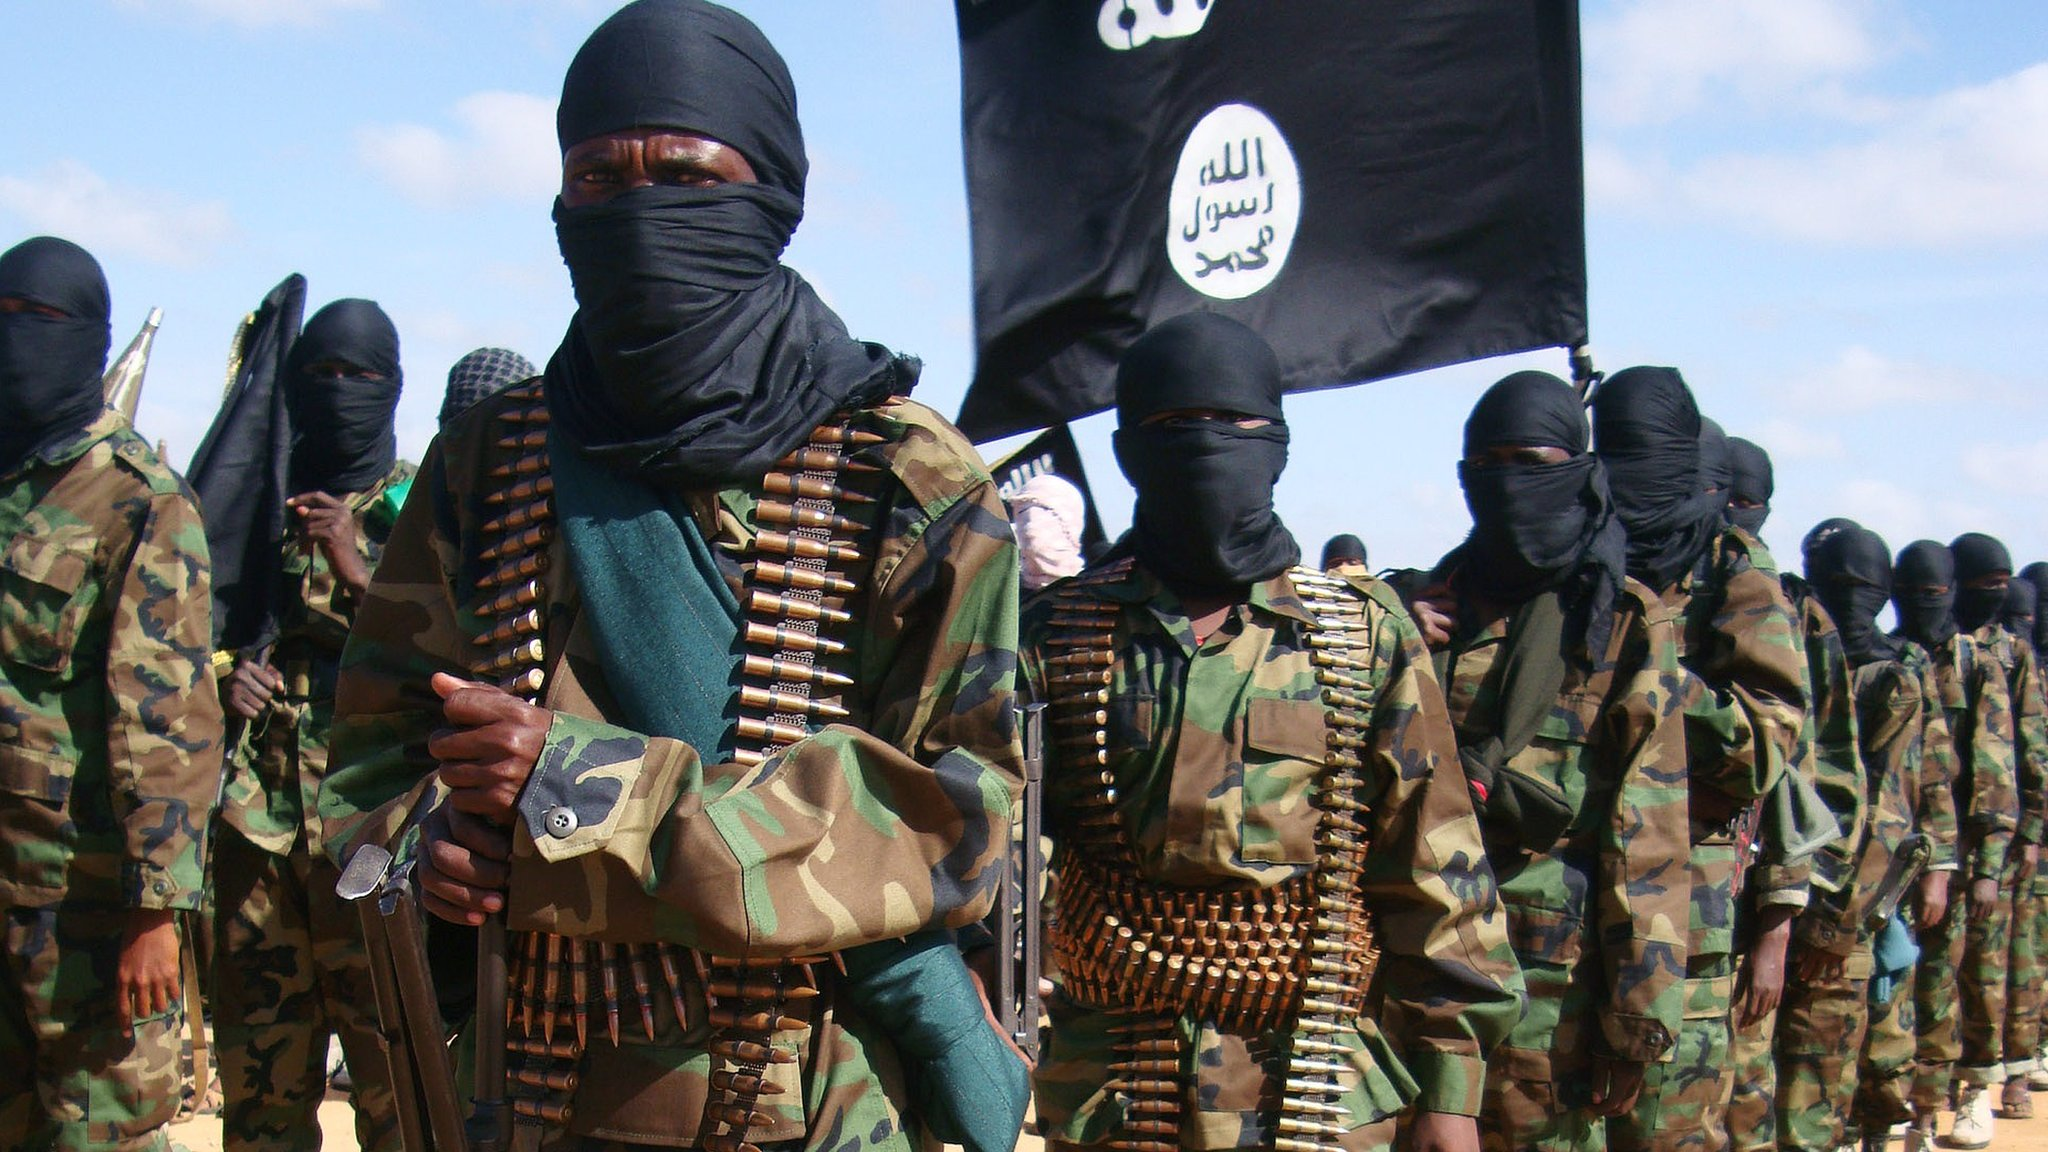 مقتل 3 أشخاص في هجوم لبوكو حرام شمال شرقي نيجيريا